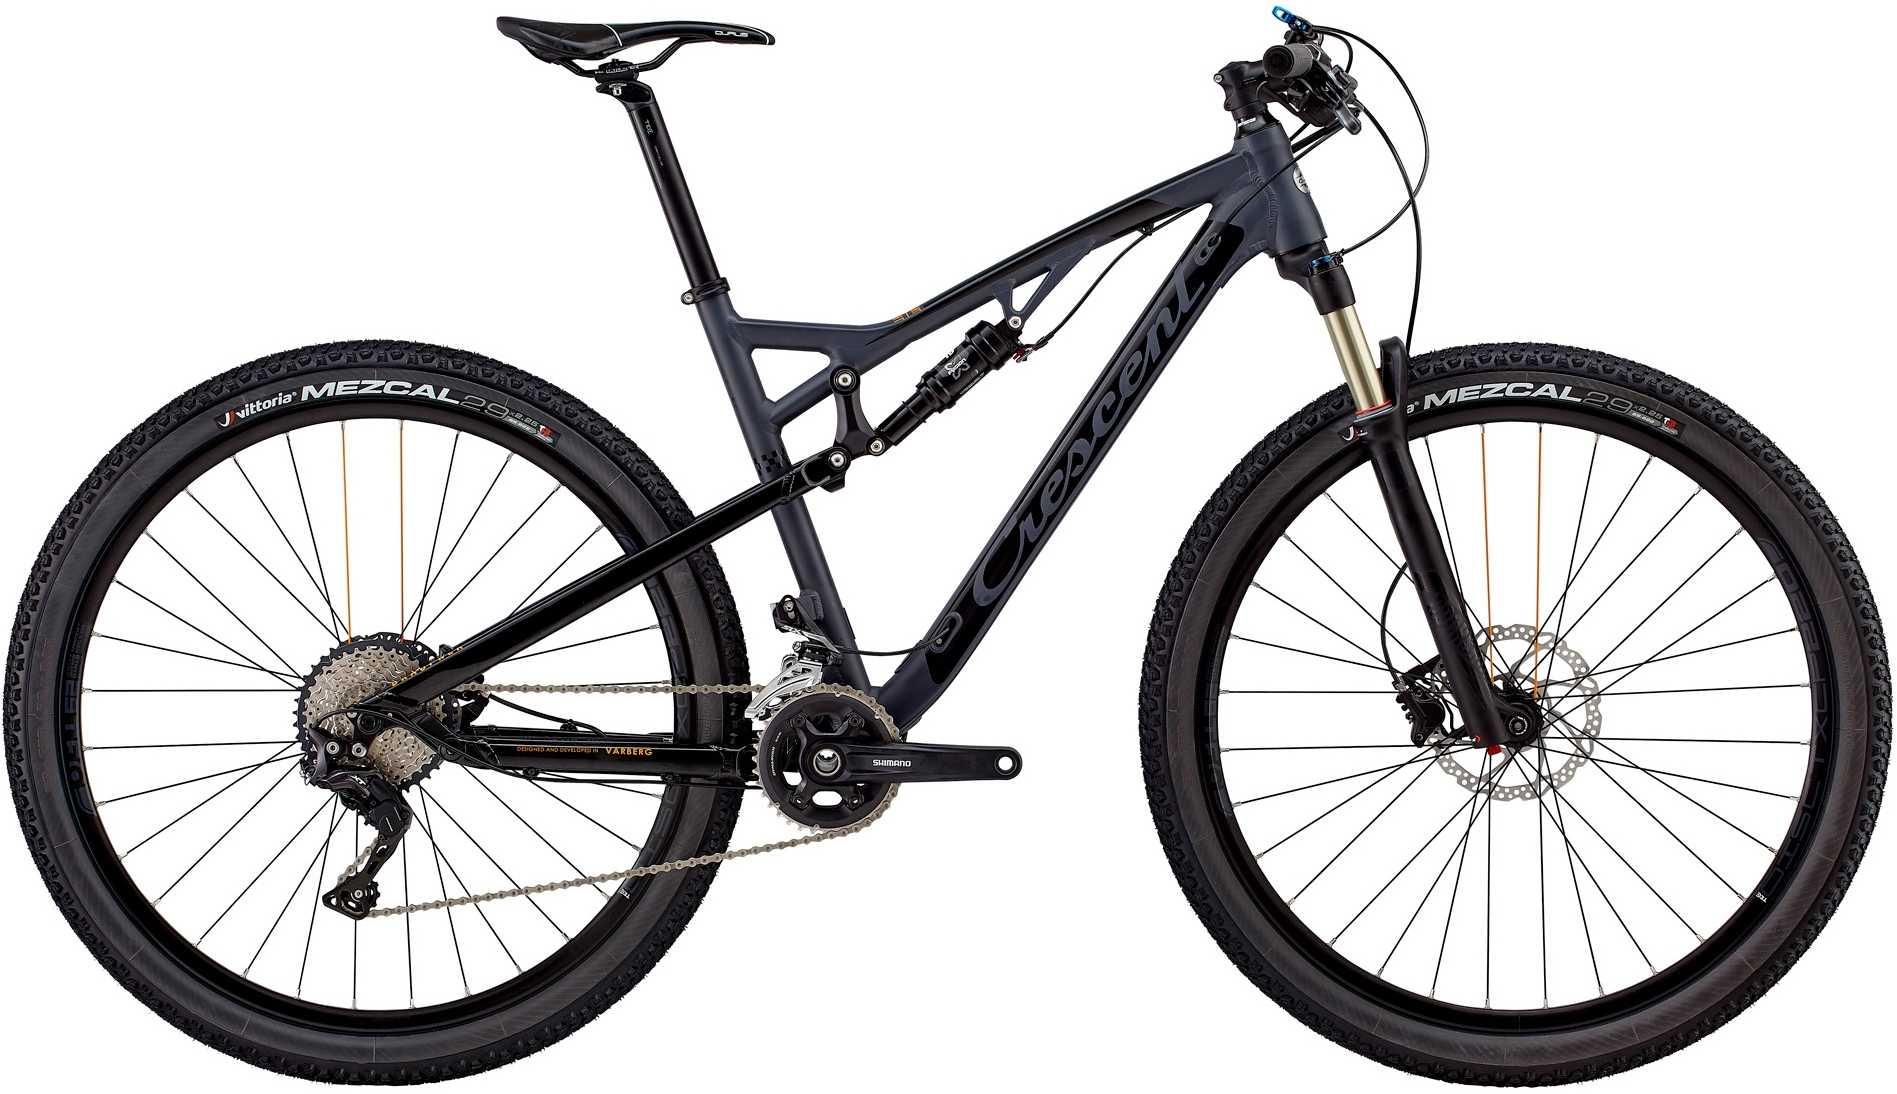 CRESCENT DRAUPNER 29 FS MATGR | Mountainbikes